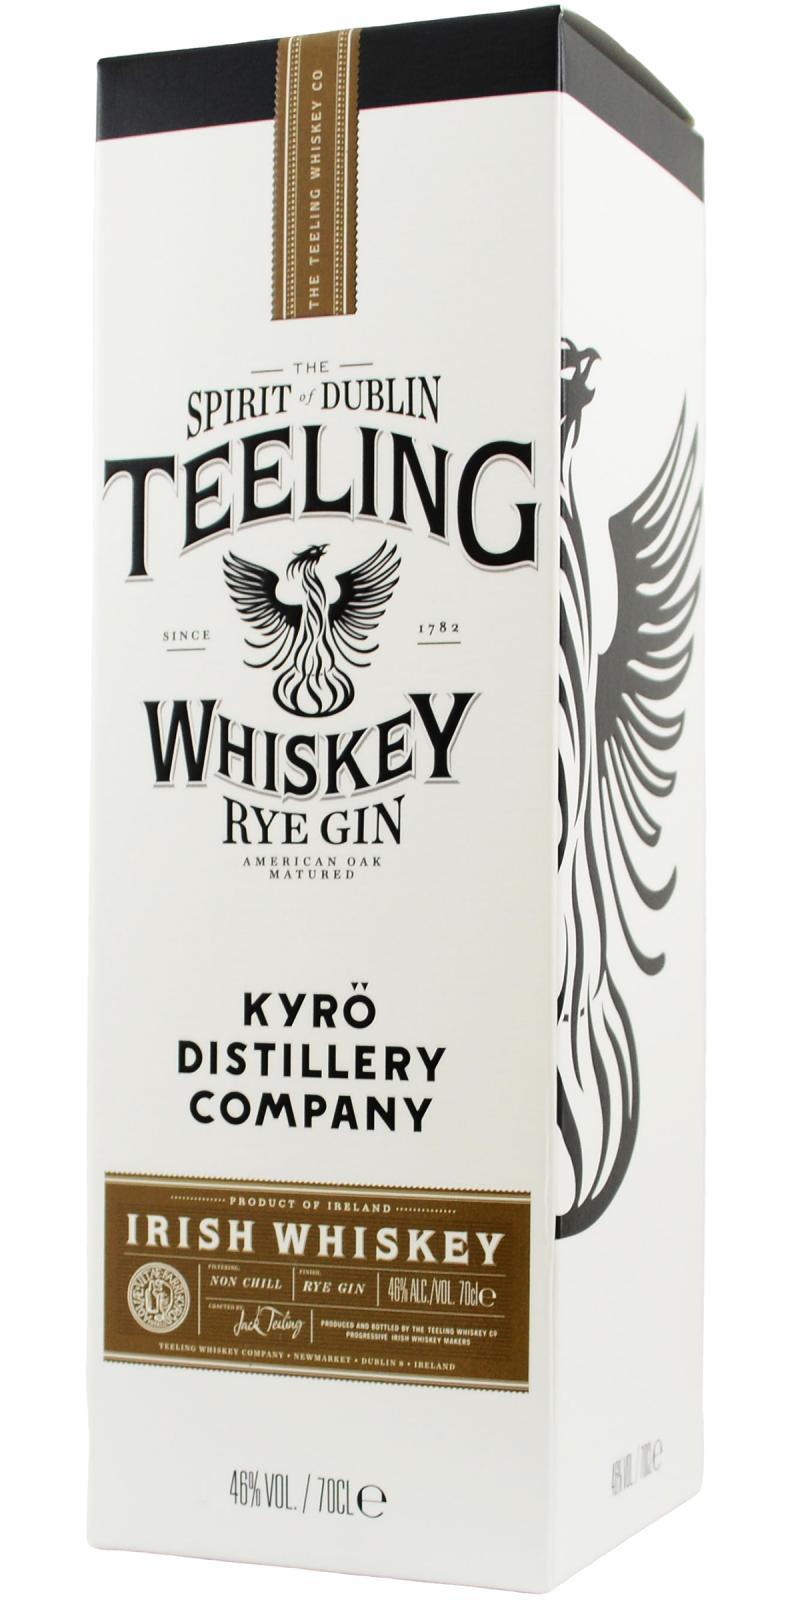 Teeling Rye Gin